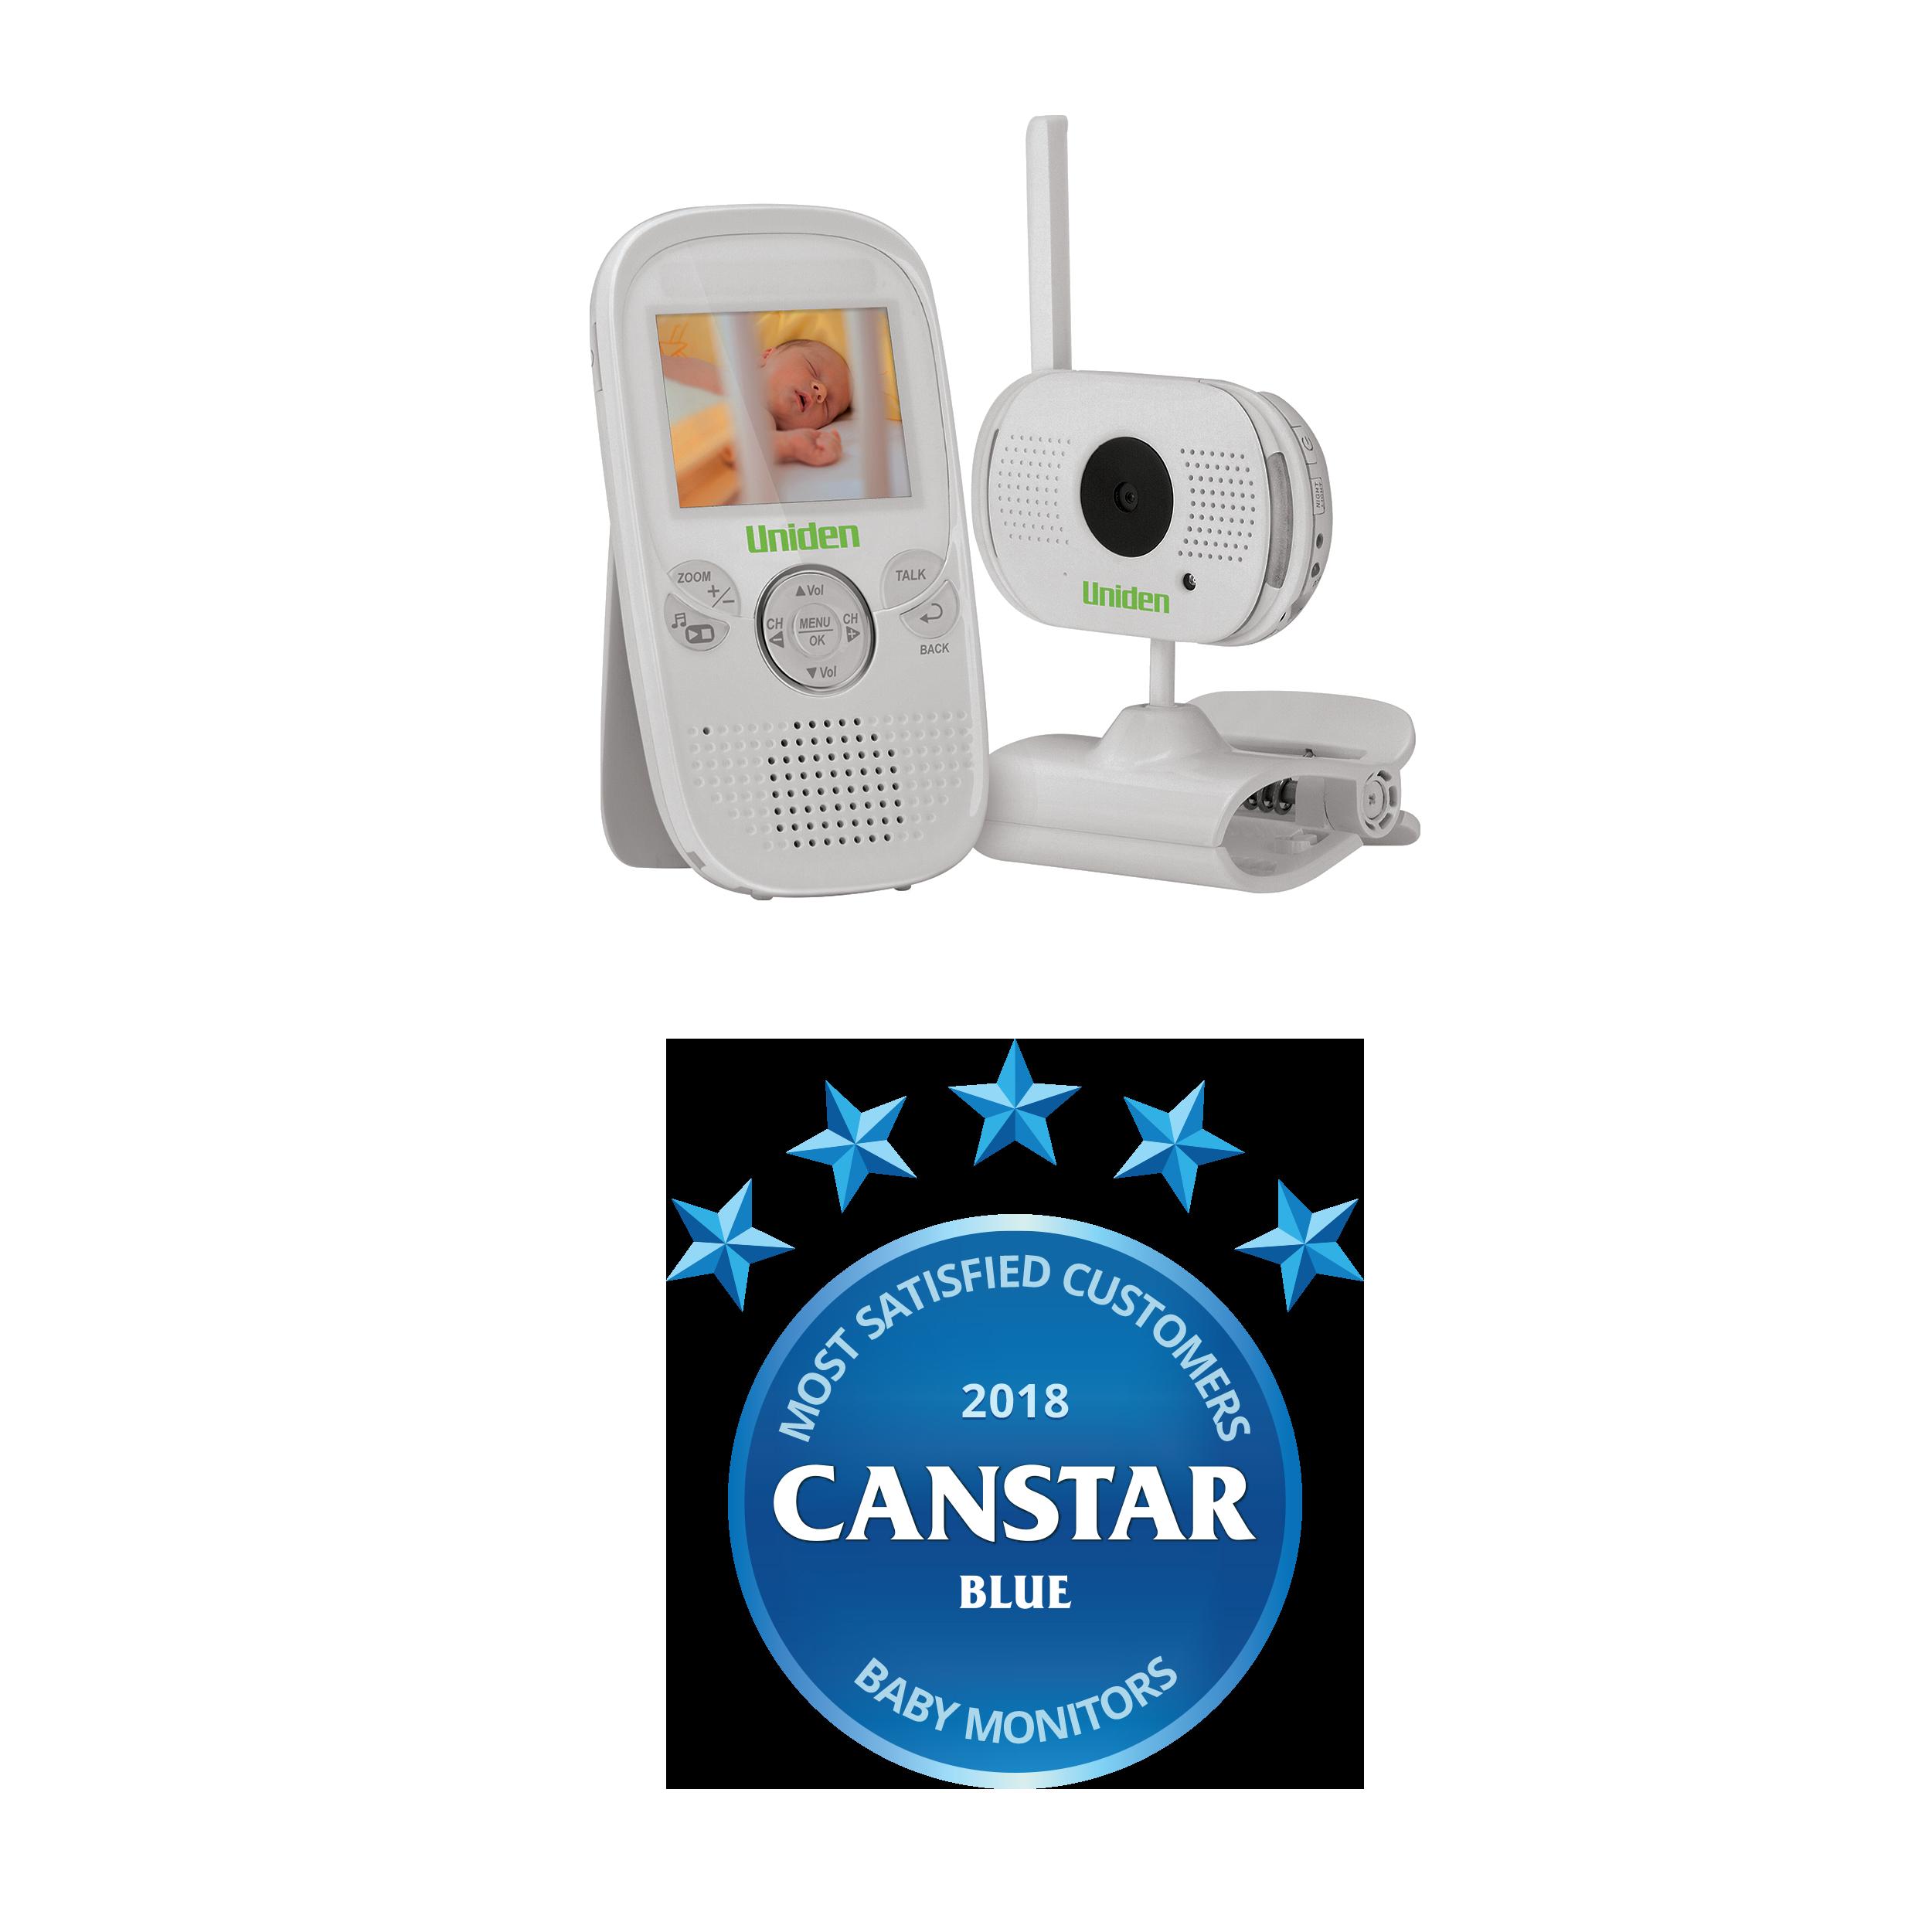 BW 3001 (Canstar)